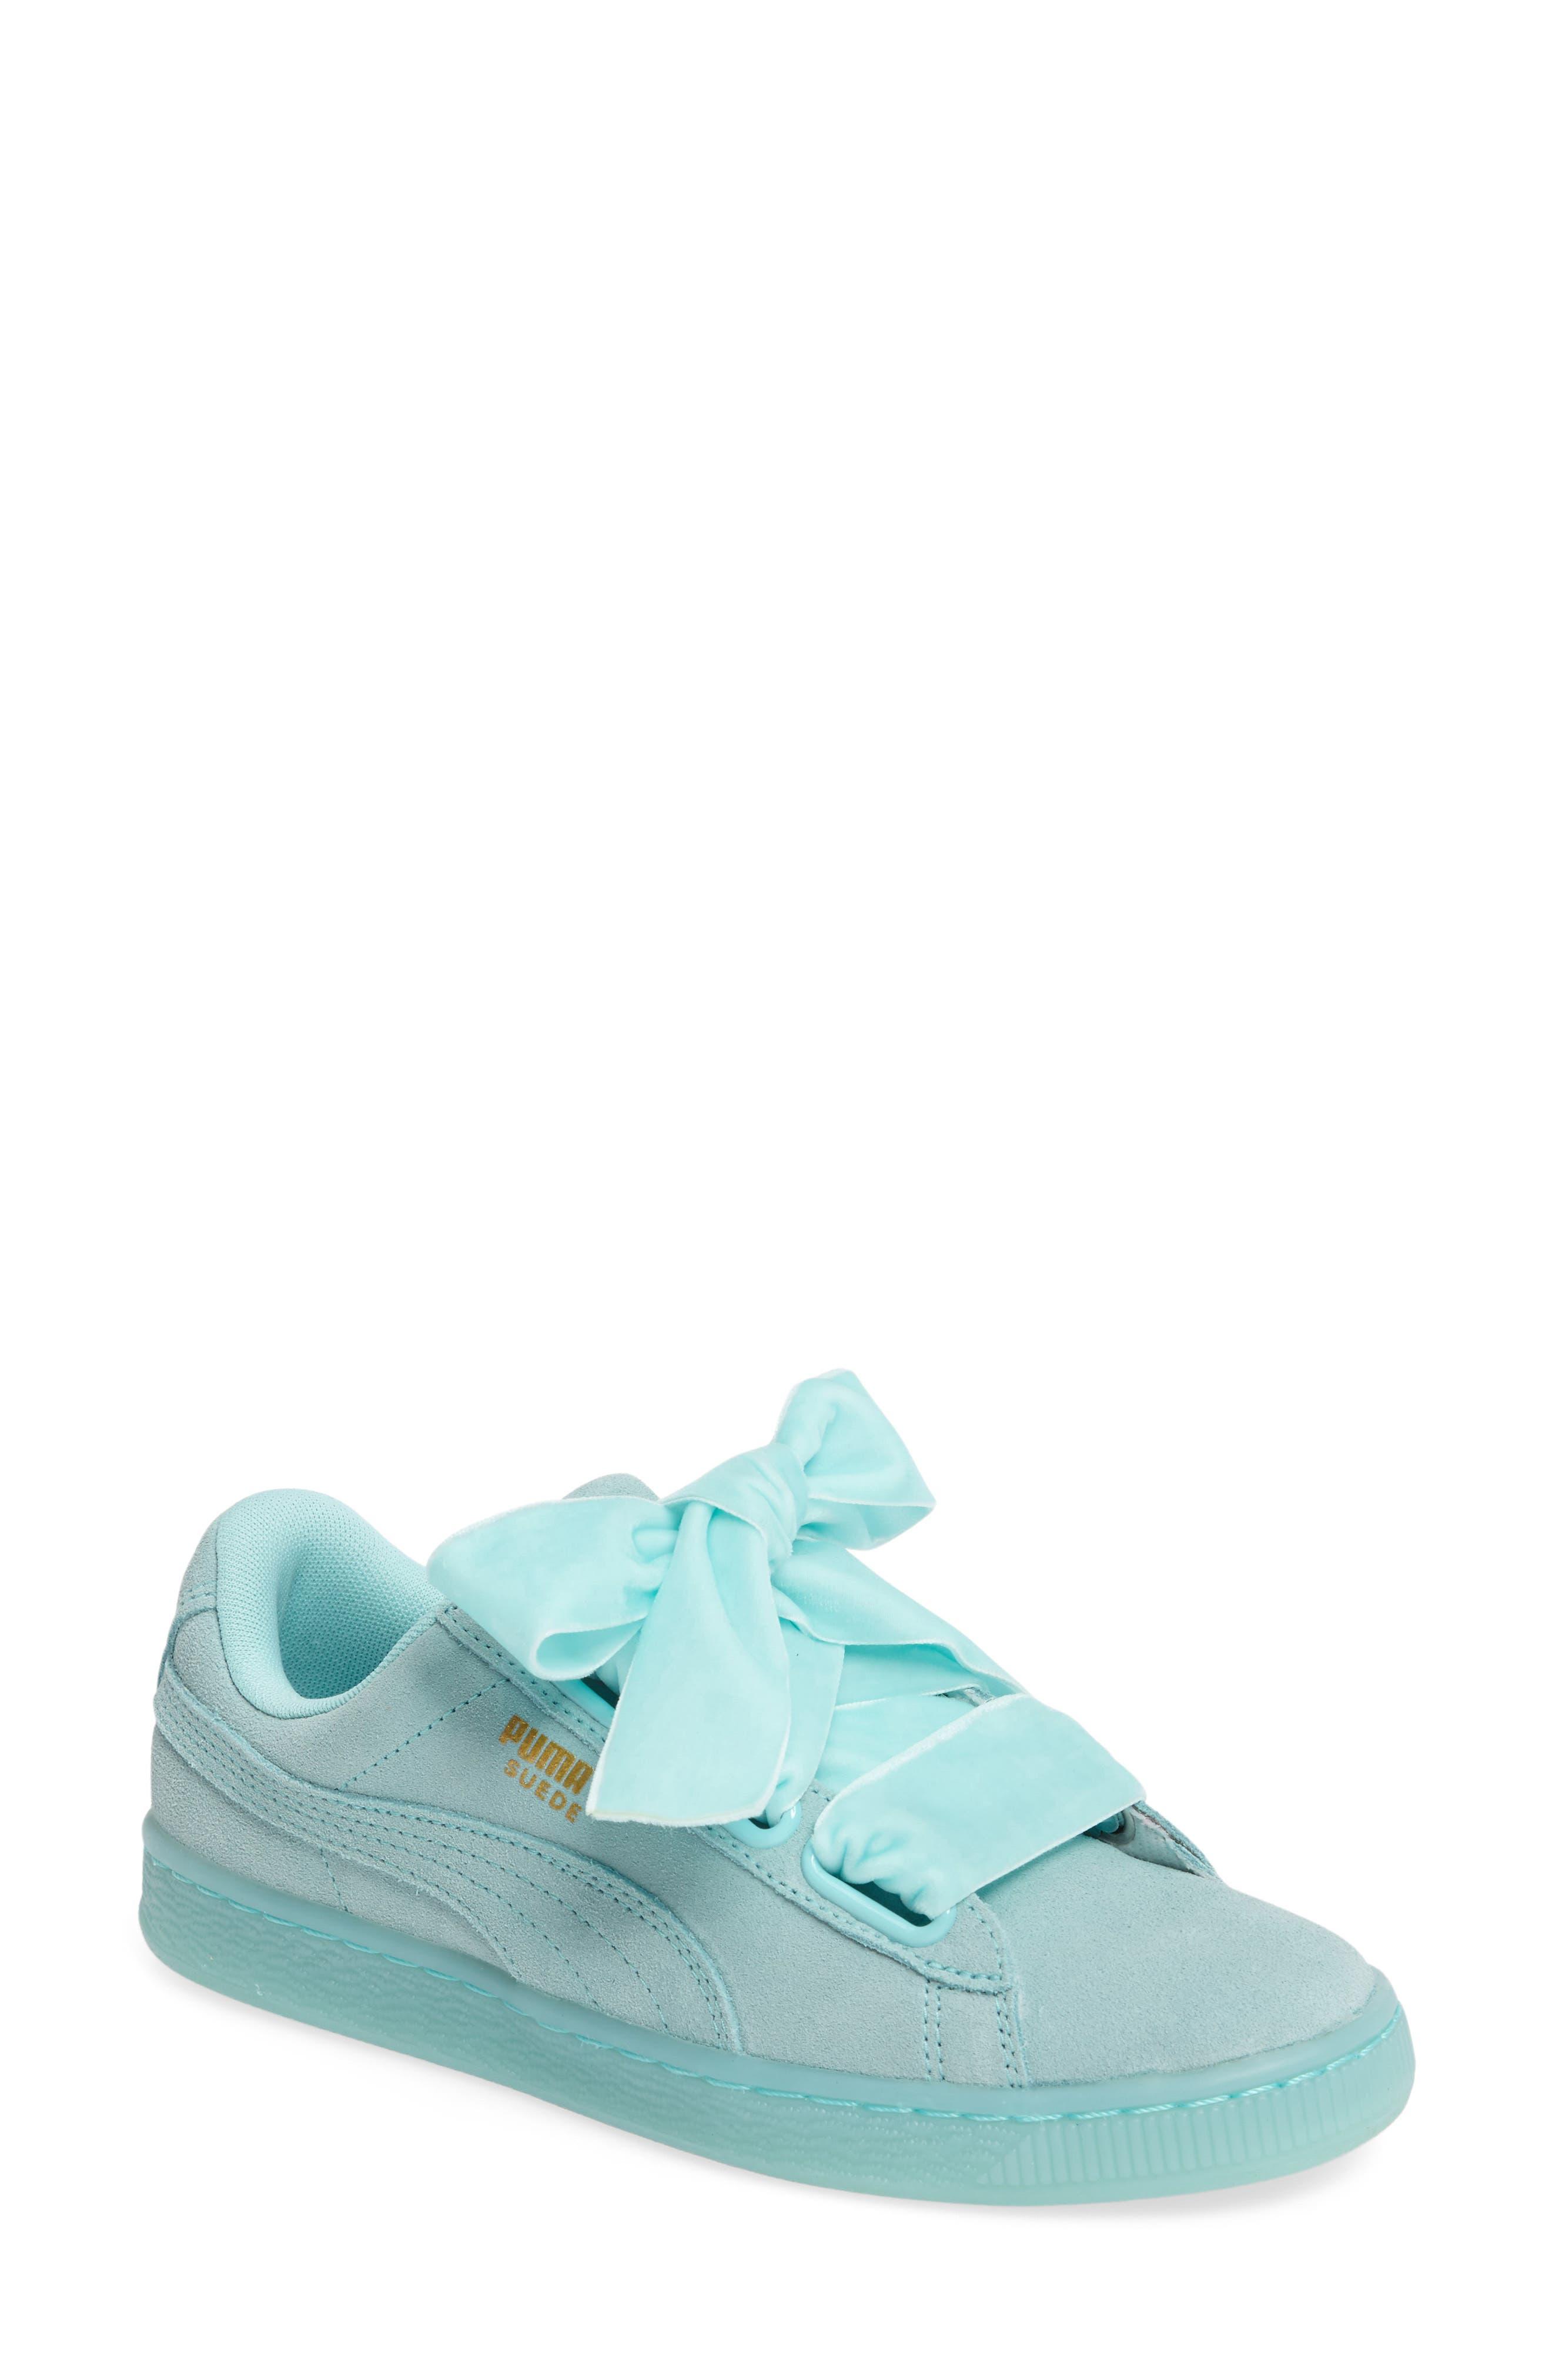 Alternate Image 1 Selected - PUMA Suede - Heart Sneaker (Women)